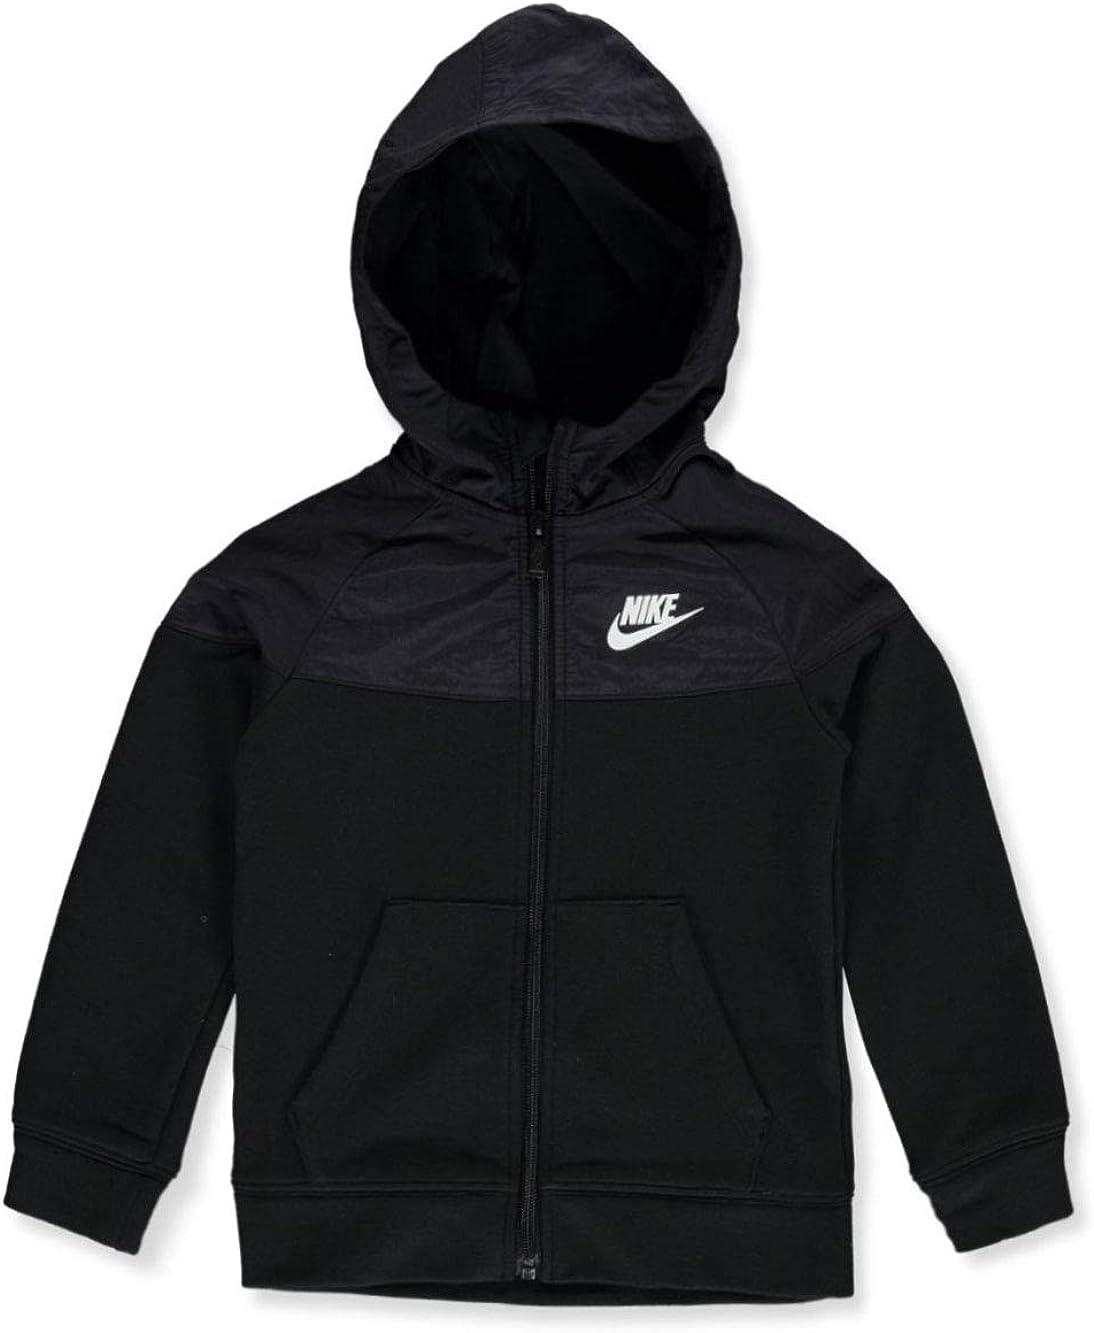 Nike SWEATER ボーイズ